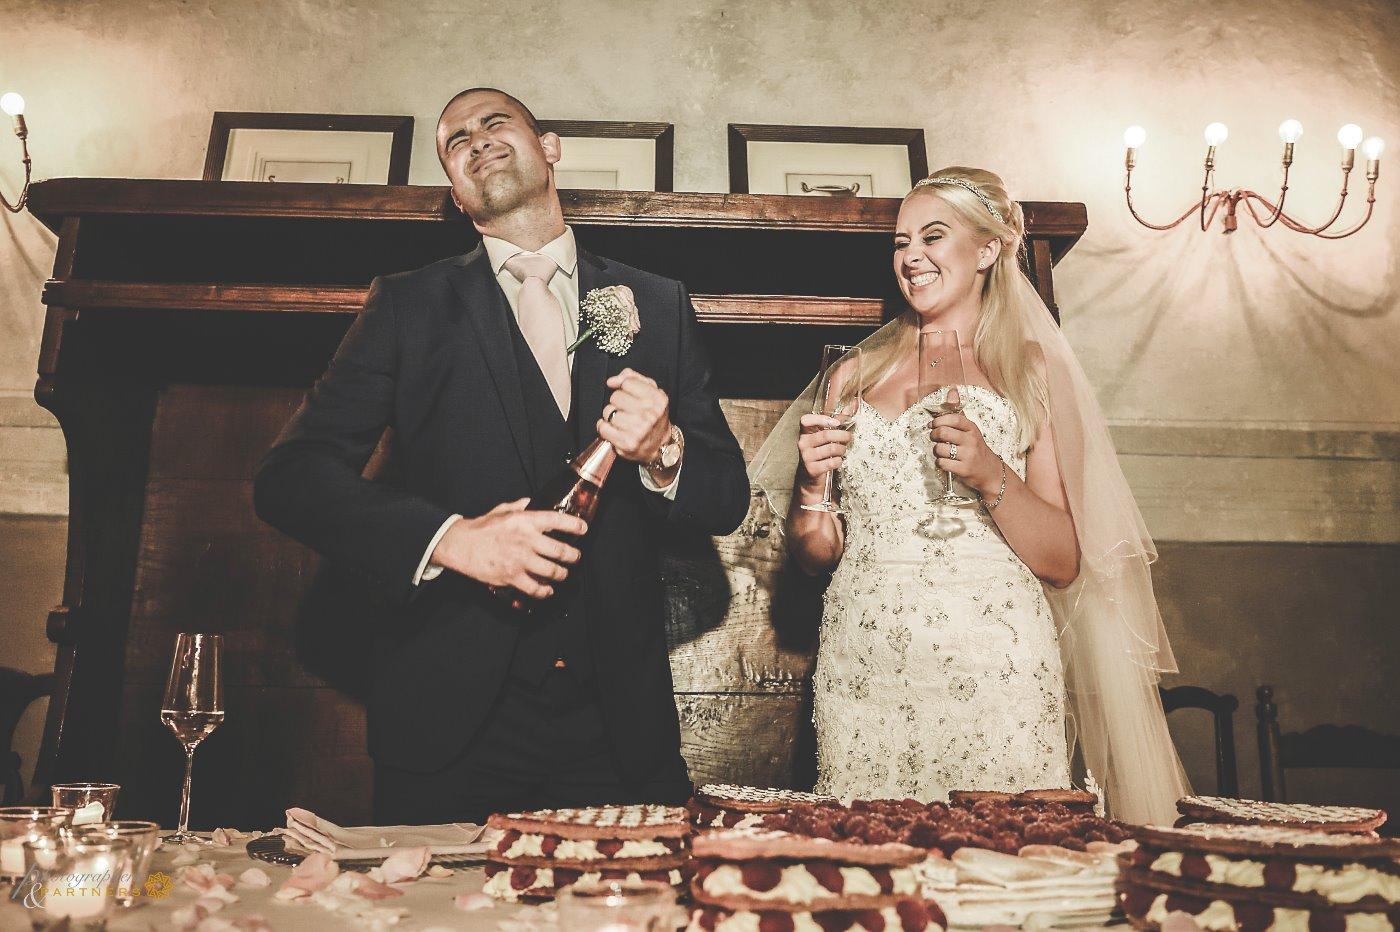 photography_weddings_catureglio_21.jpg